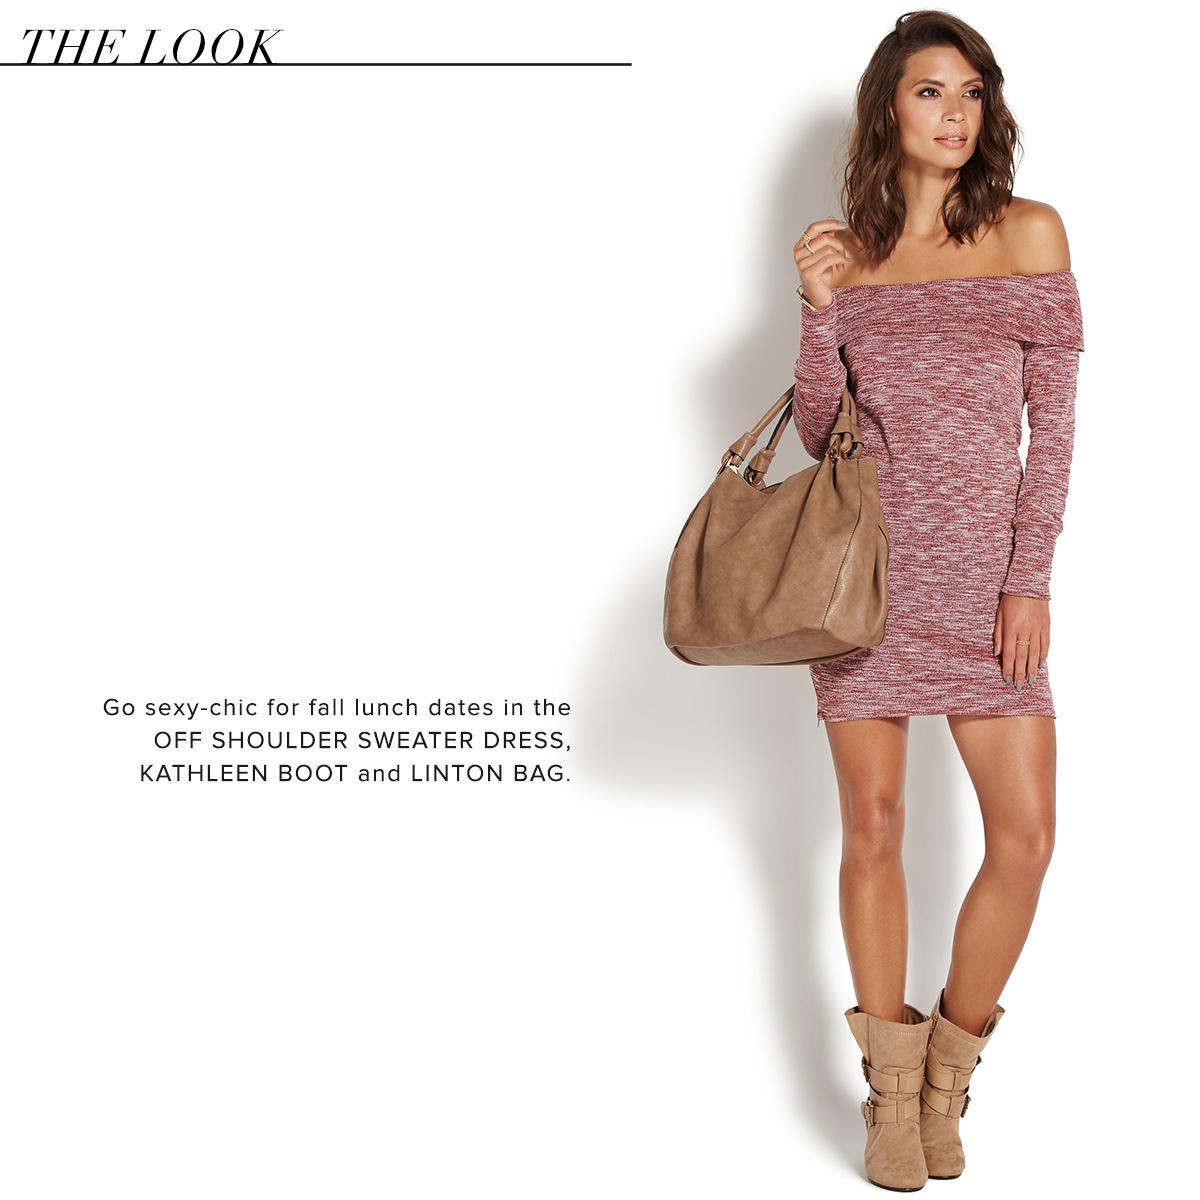 OFF SHOULDER SWEATER DRESS - ShoeDazzle